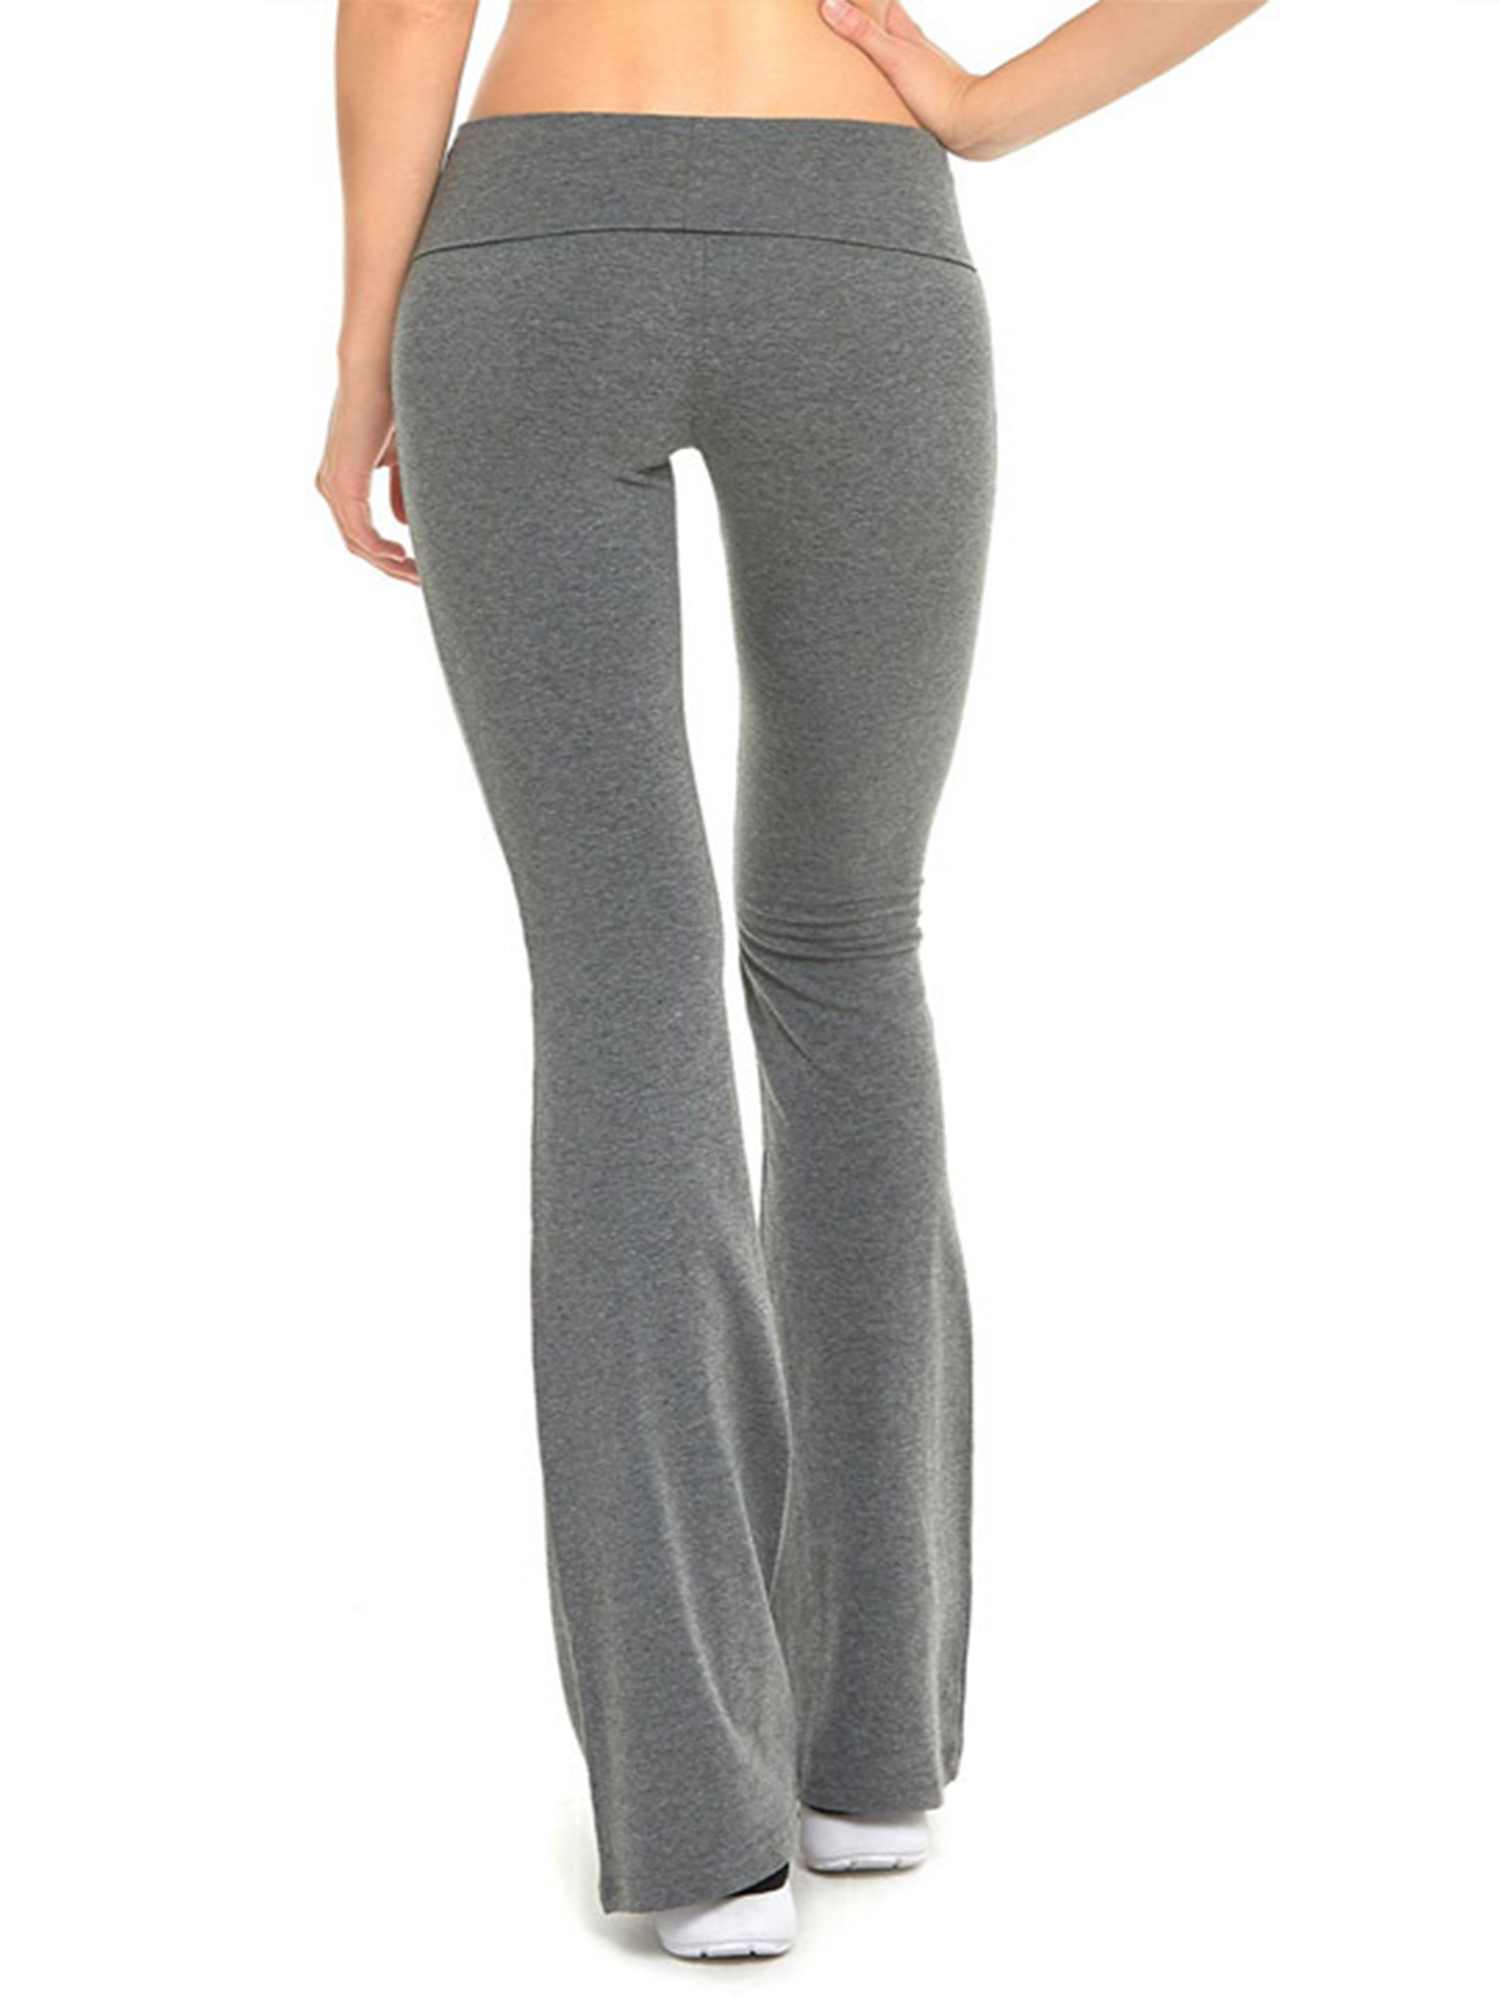 Womens Yoga Pants Bootcut Run Gym Jogger Leggings Flare Trousers Wide Leg Ladies